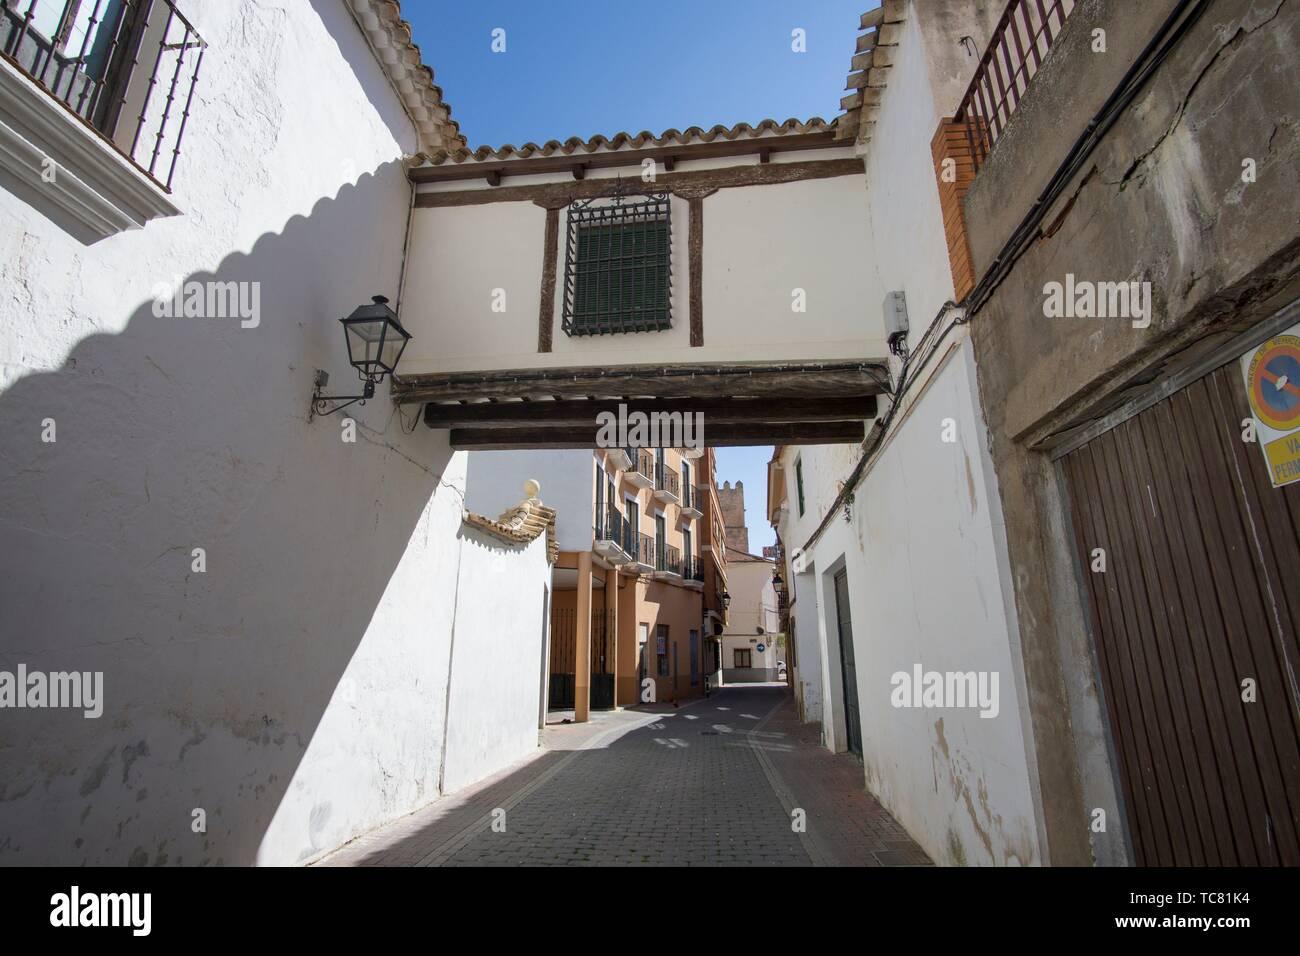 San Clemente town in Cuenca Castile La Mancha Spain. Stock Photo